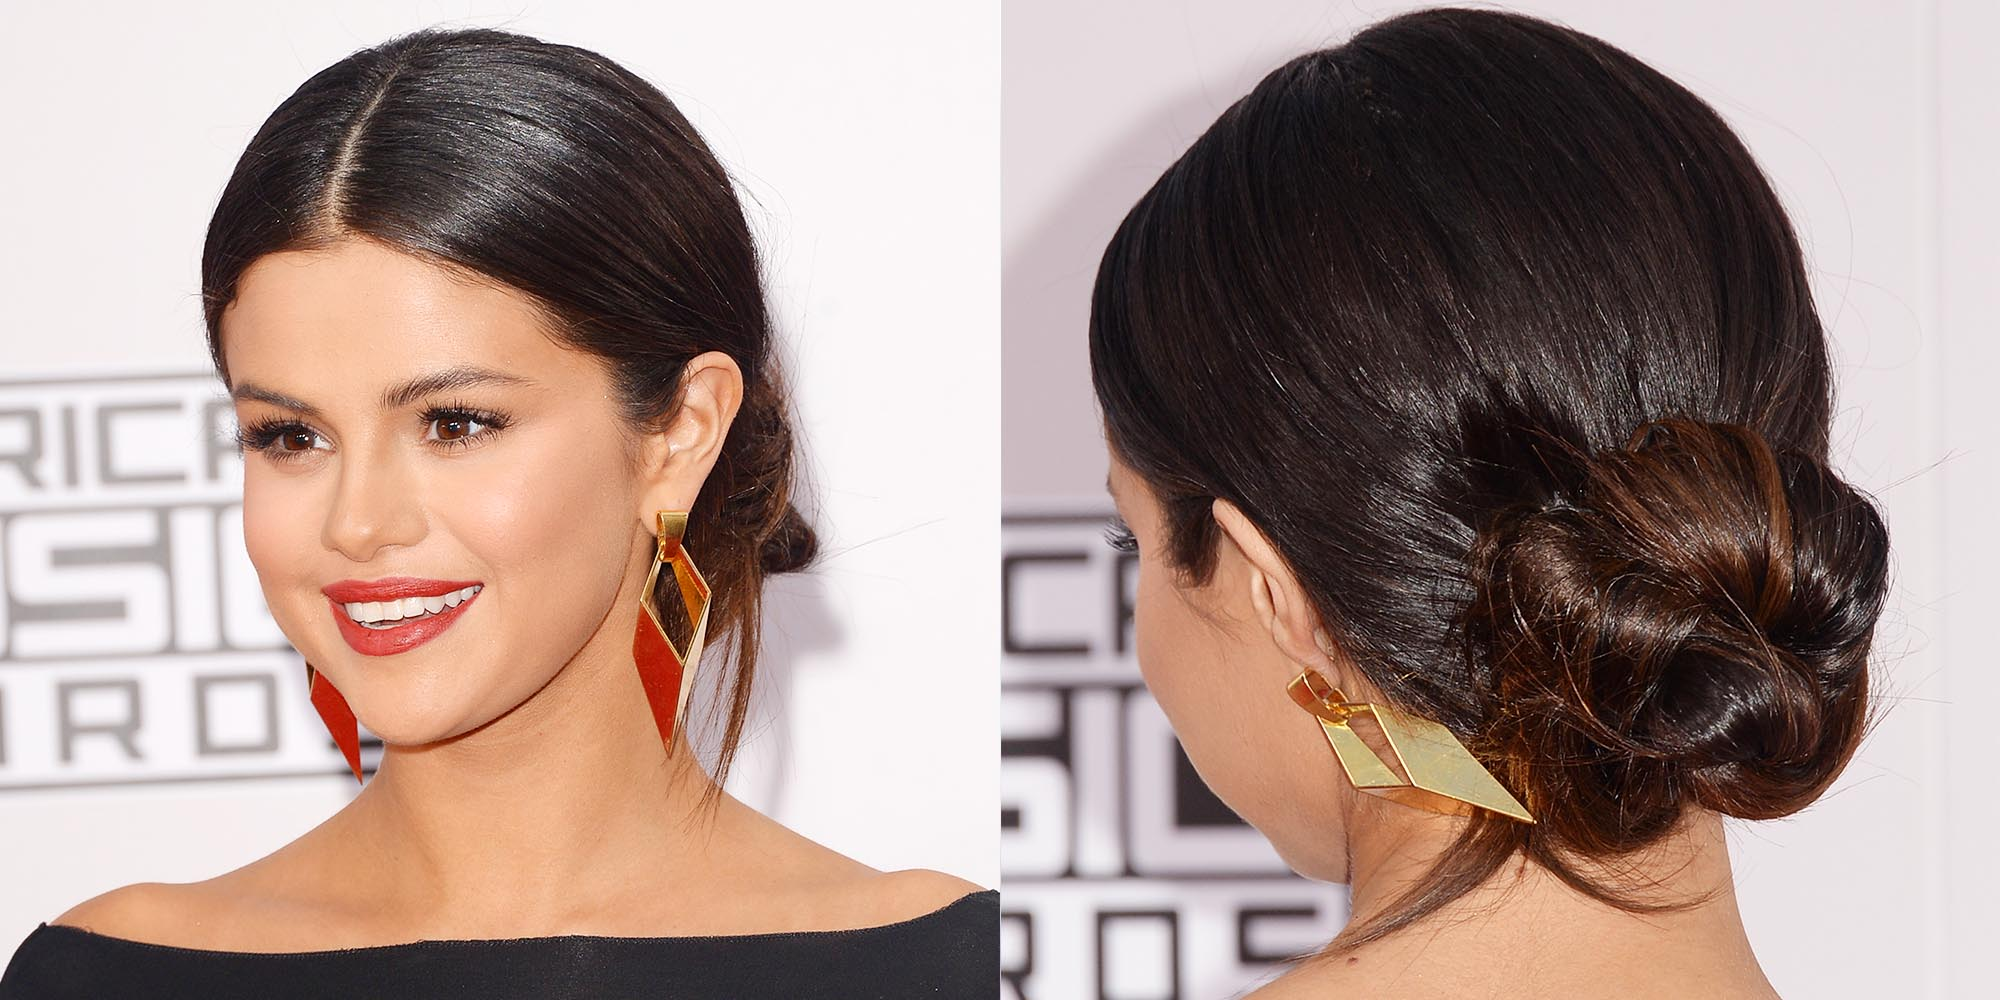 Wondrous Best Selena Gomez Hairstyles 32 Hair Ideas From Selena Gomez Short Hairstyles Gunalazisus